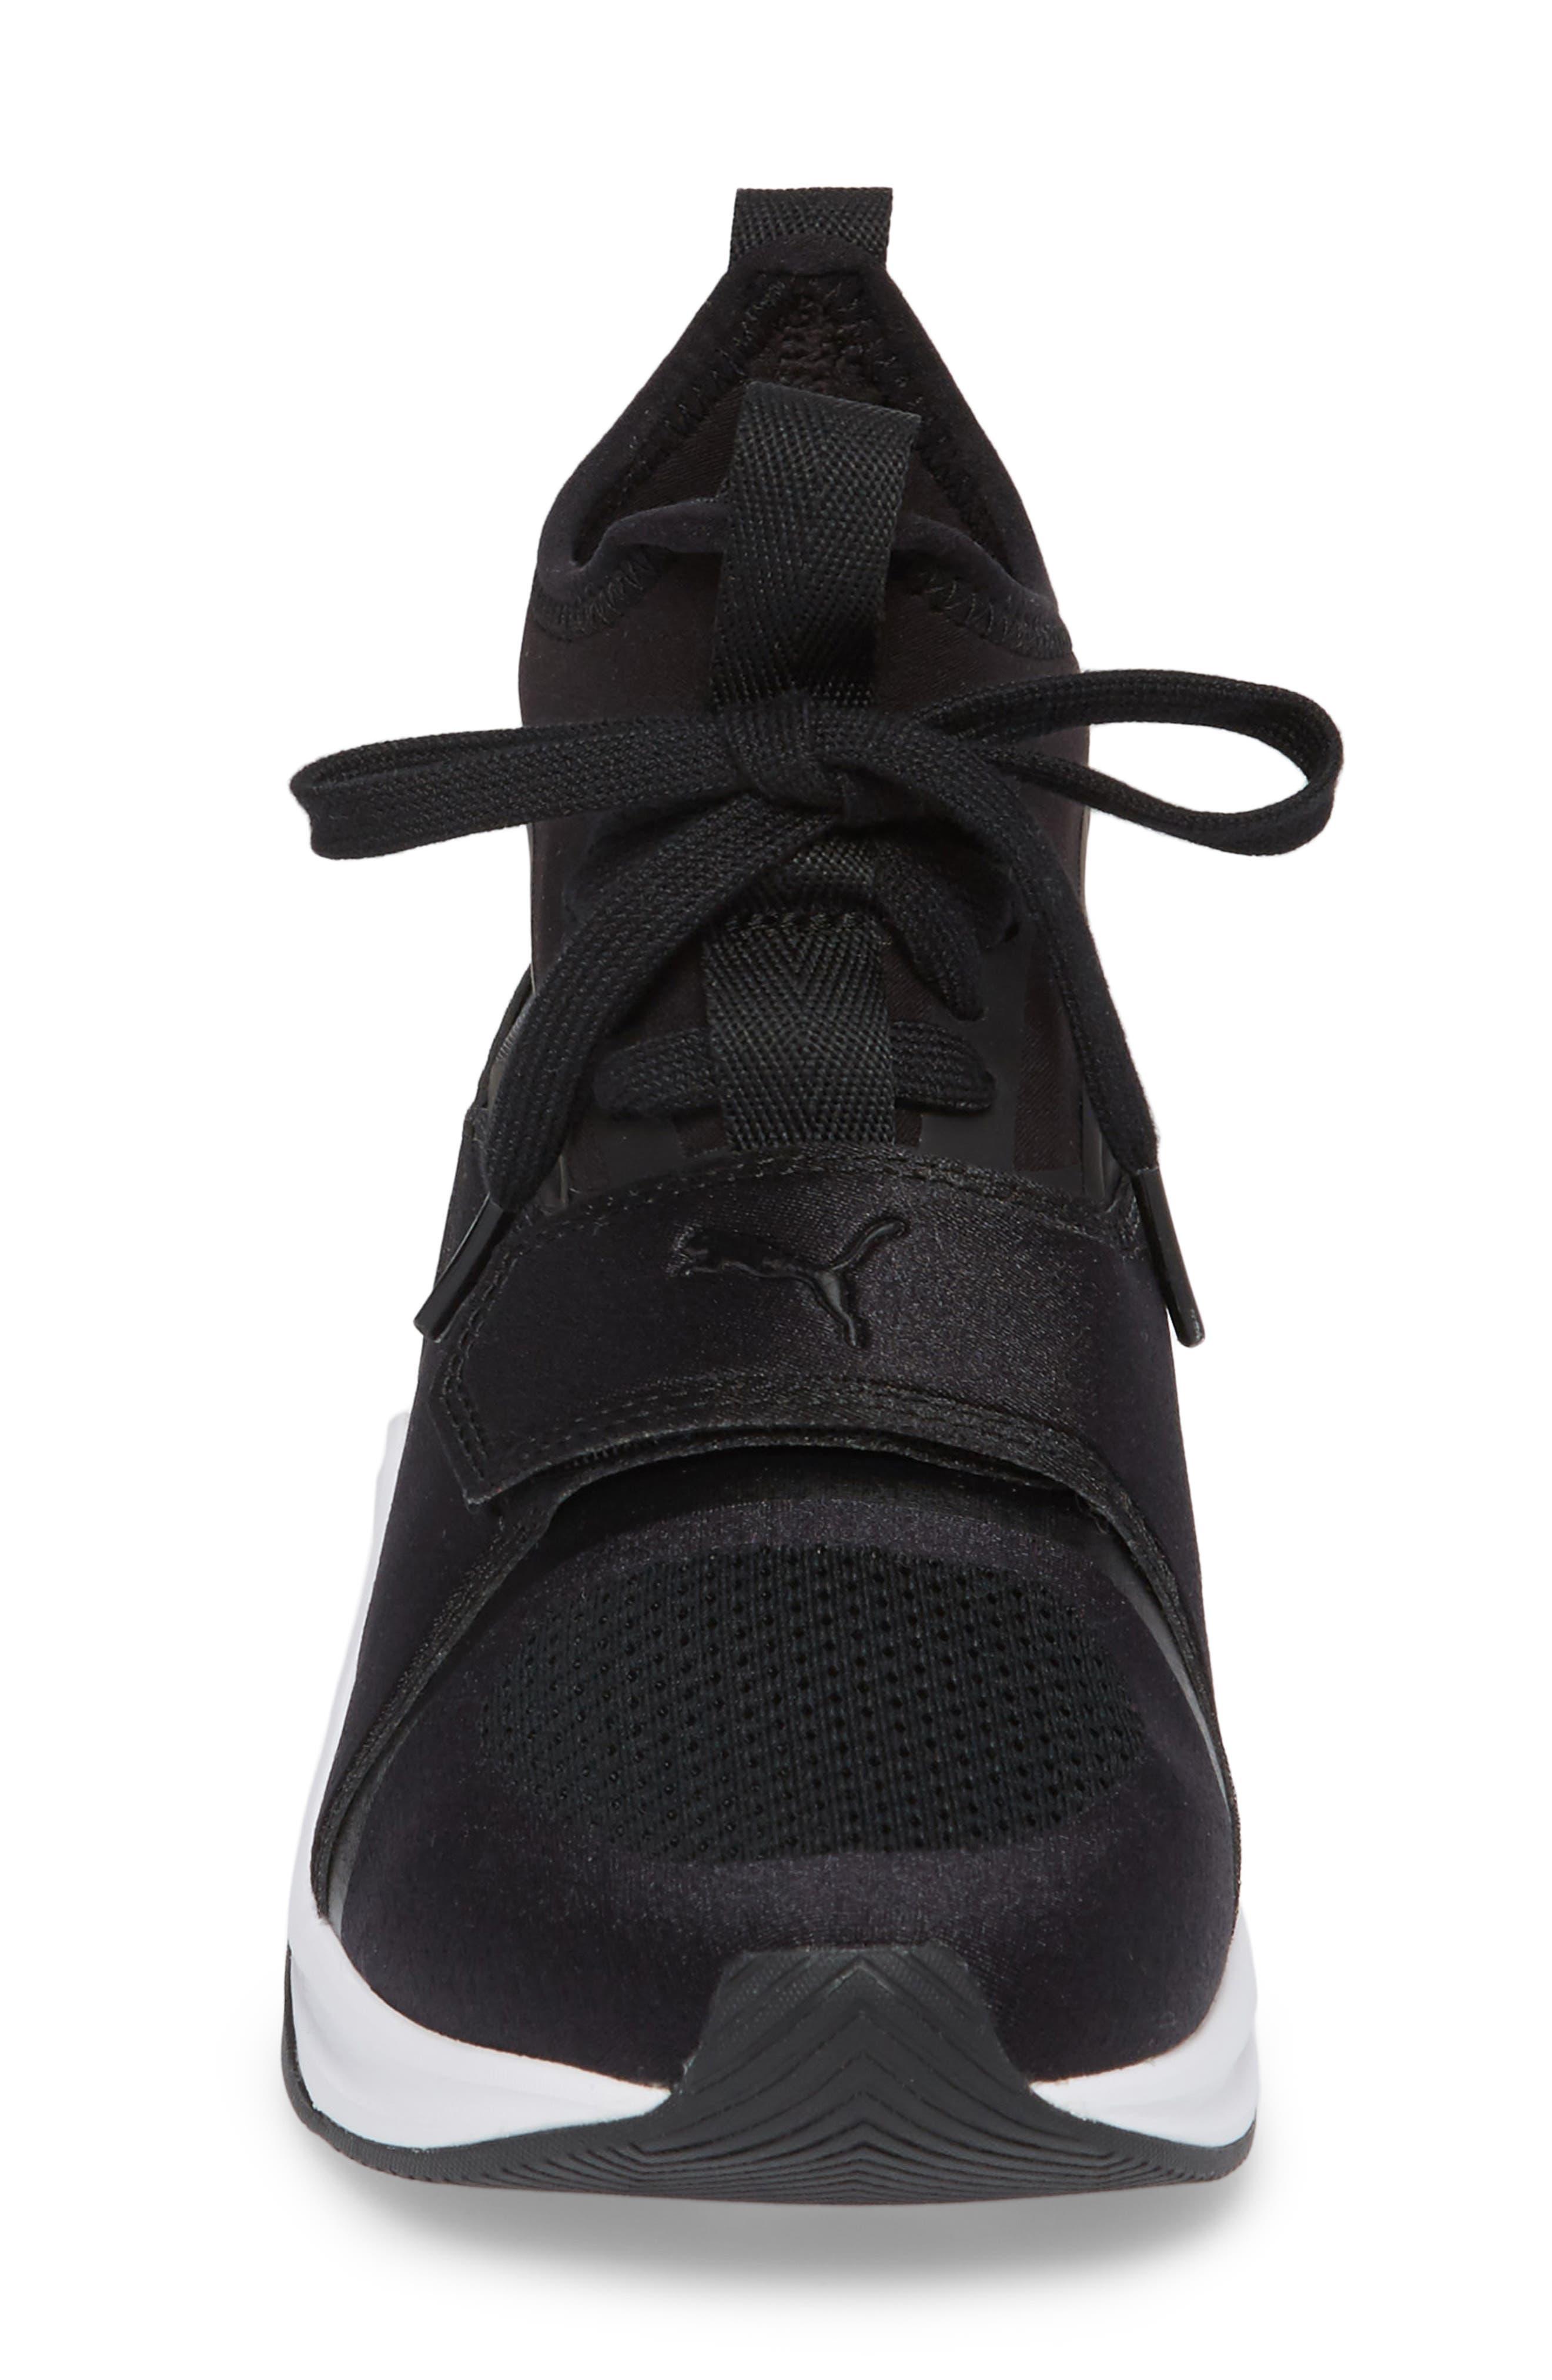 Phenom Jr High Top Sneaker,                             Alternate thumbnail 4, color,                             Puma Black/ Puma White